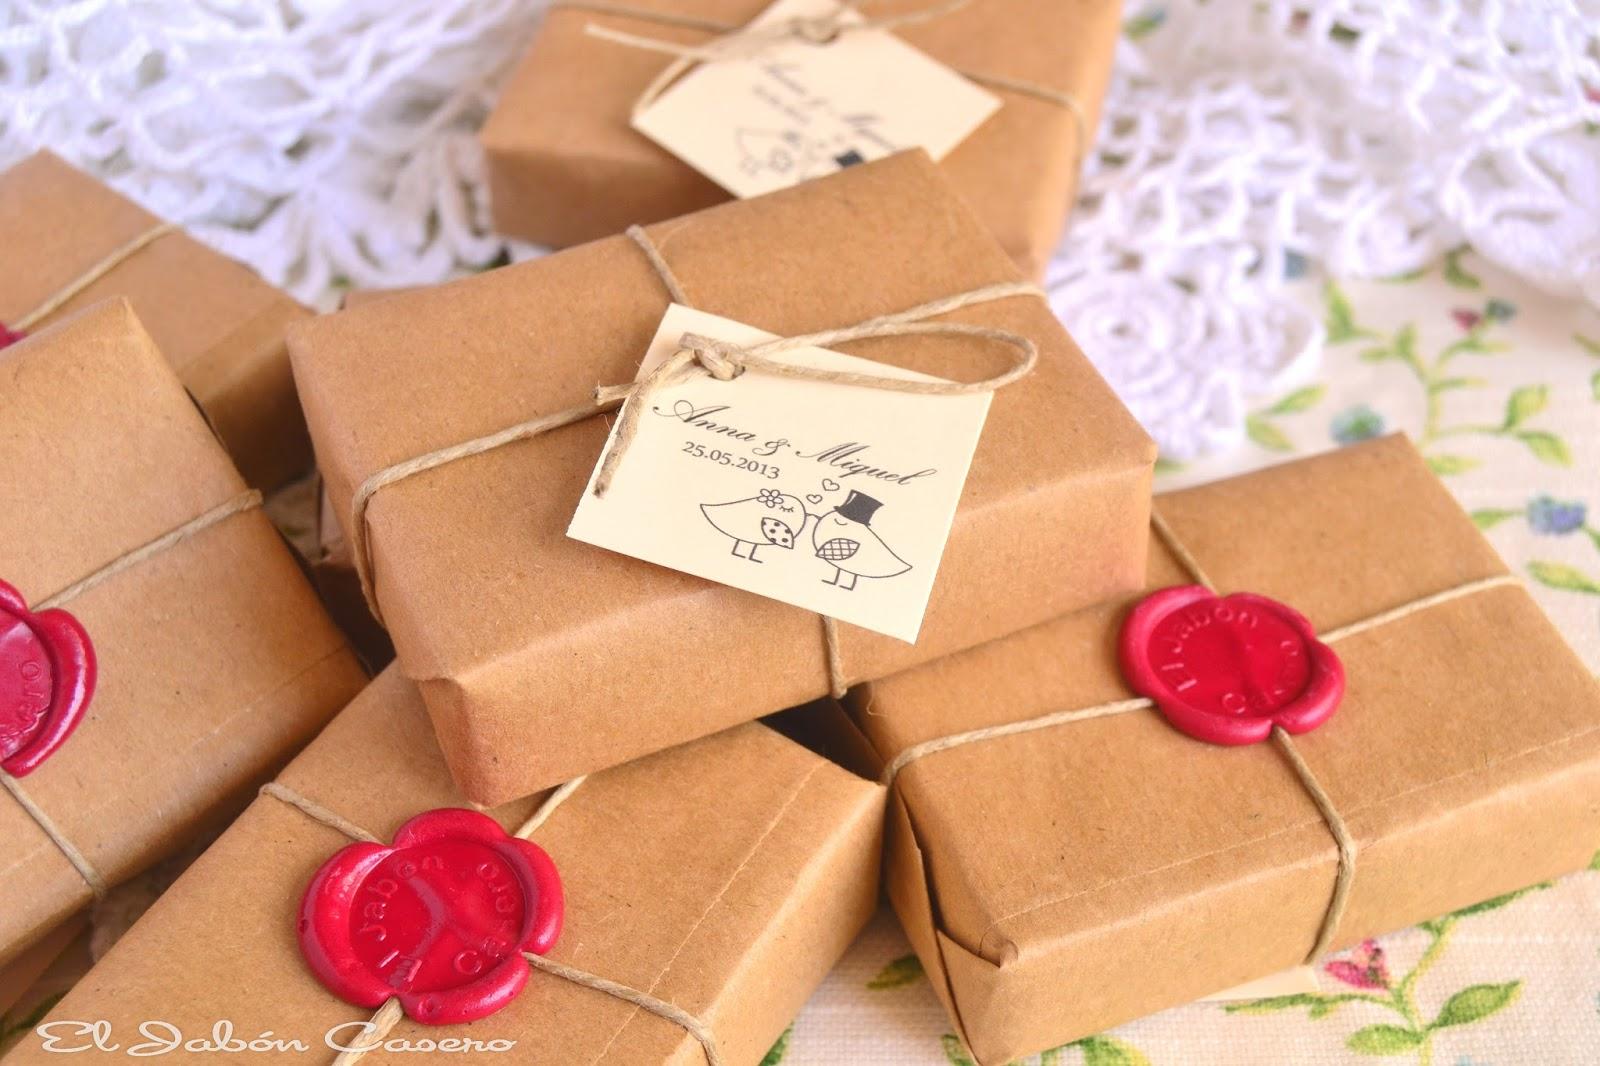 Detalles para bodas ecologicas habones caseros